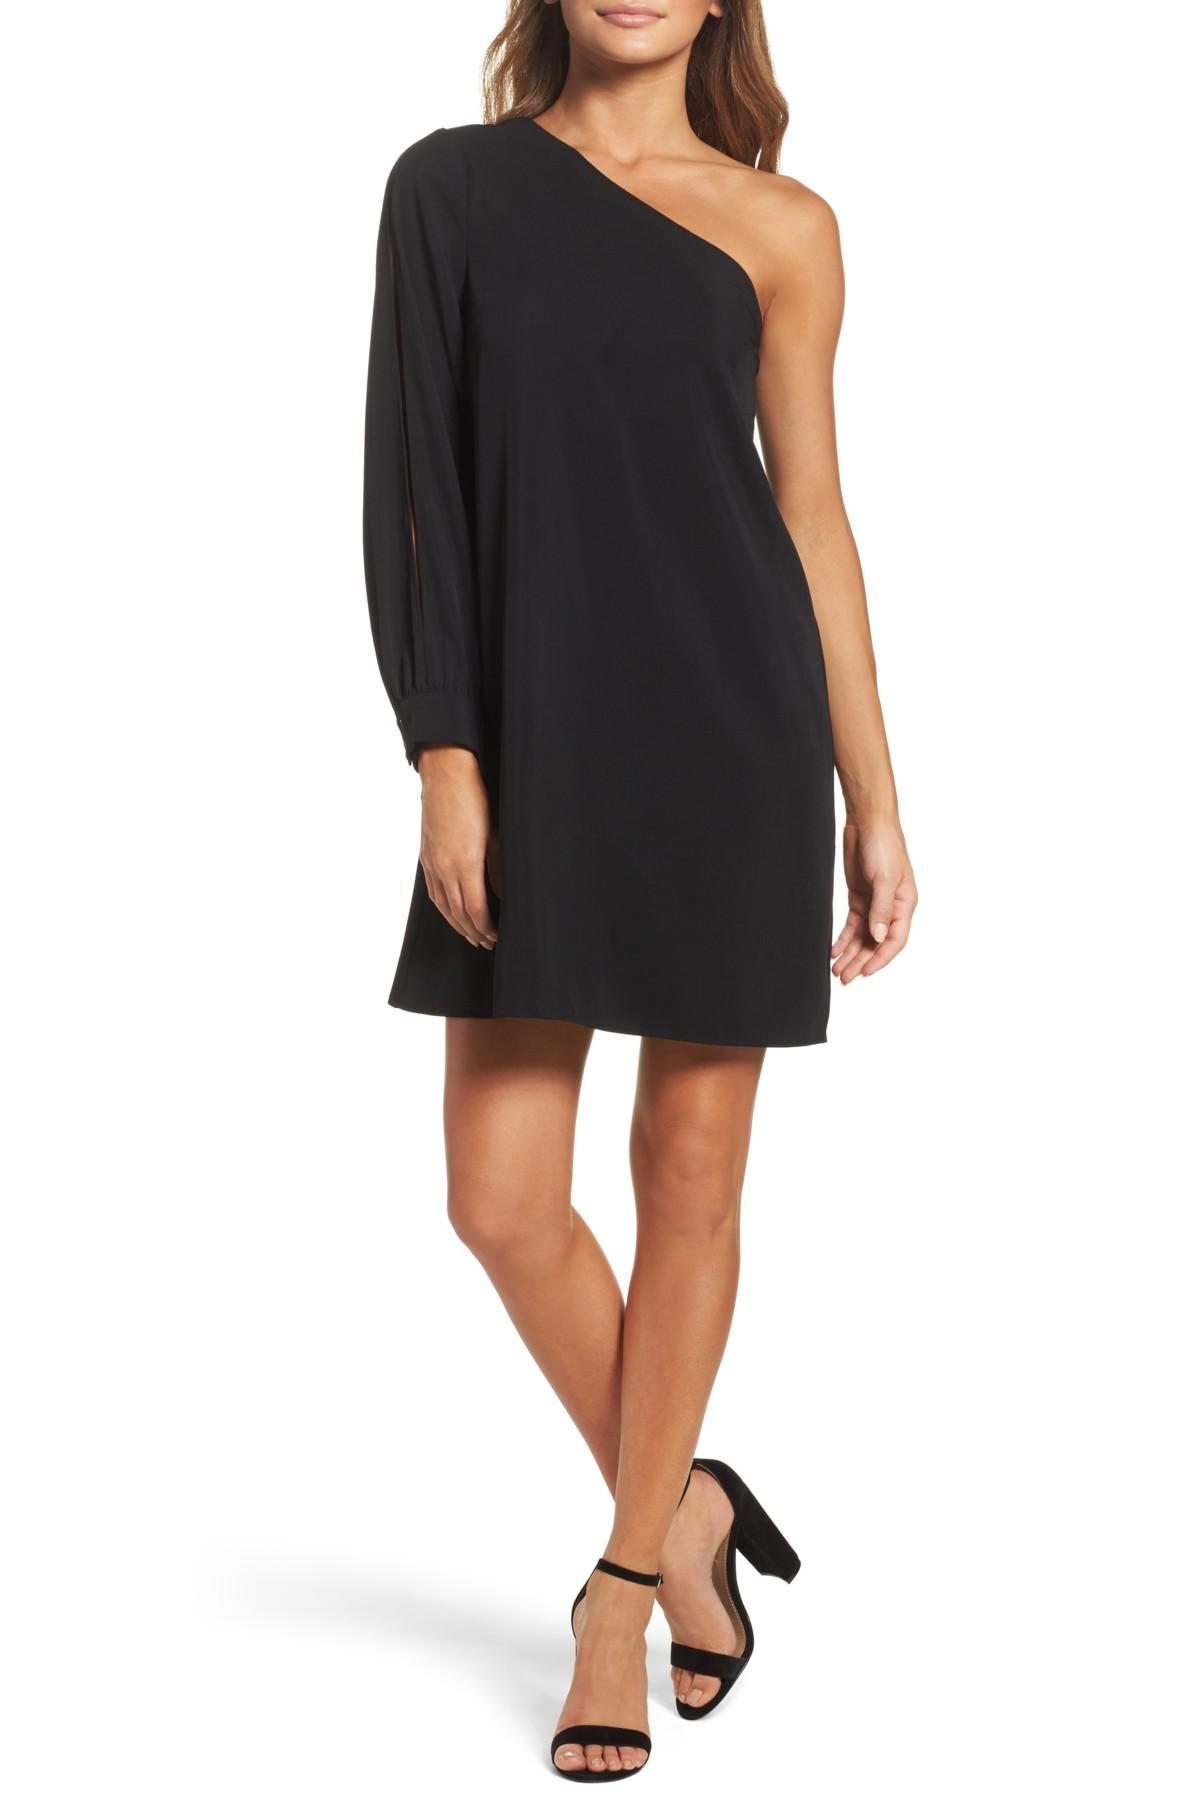 097812fca36c Chelsea28 One-shoulder Shift Dress in Black - Lyst